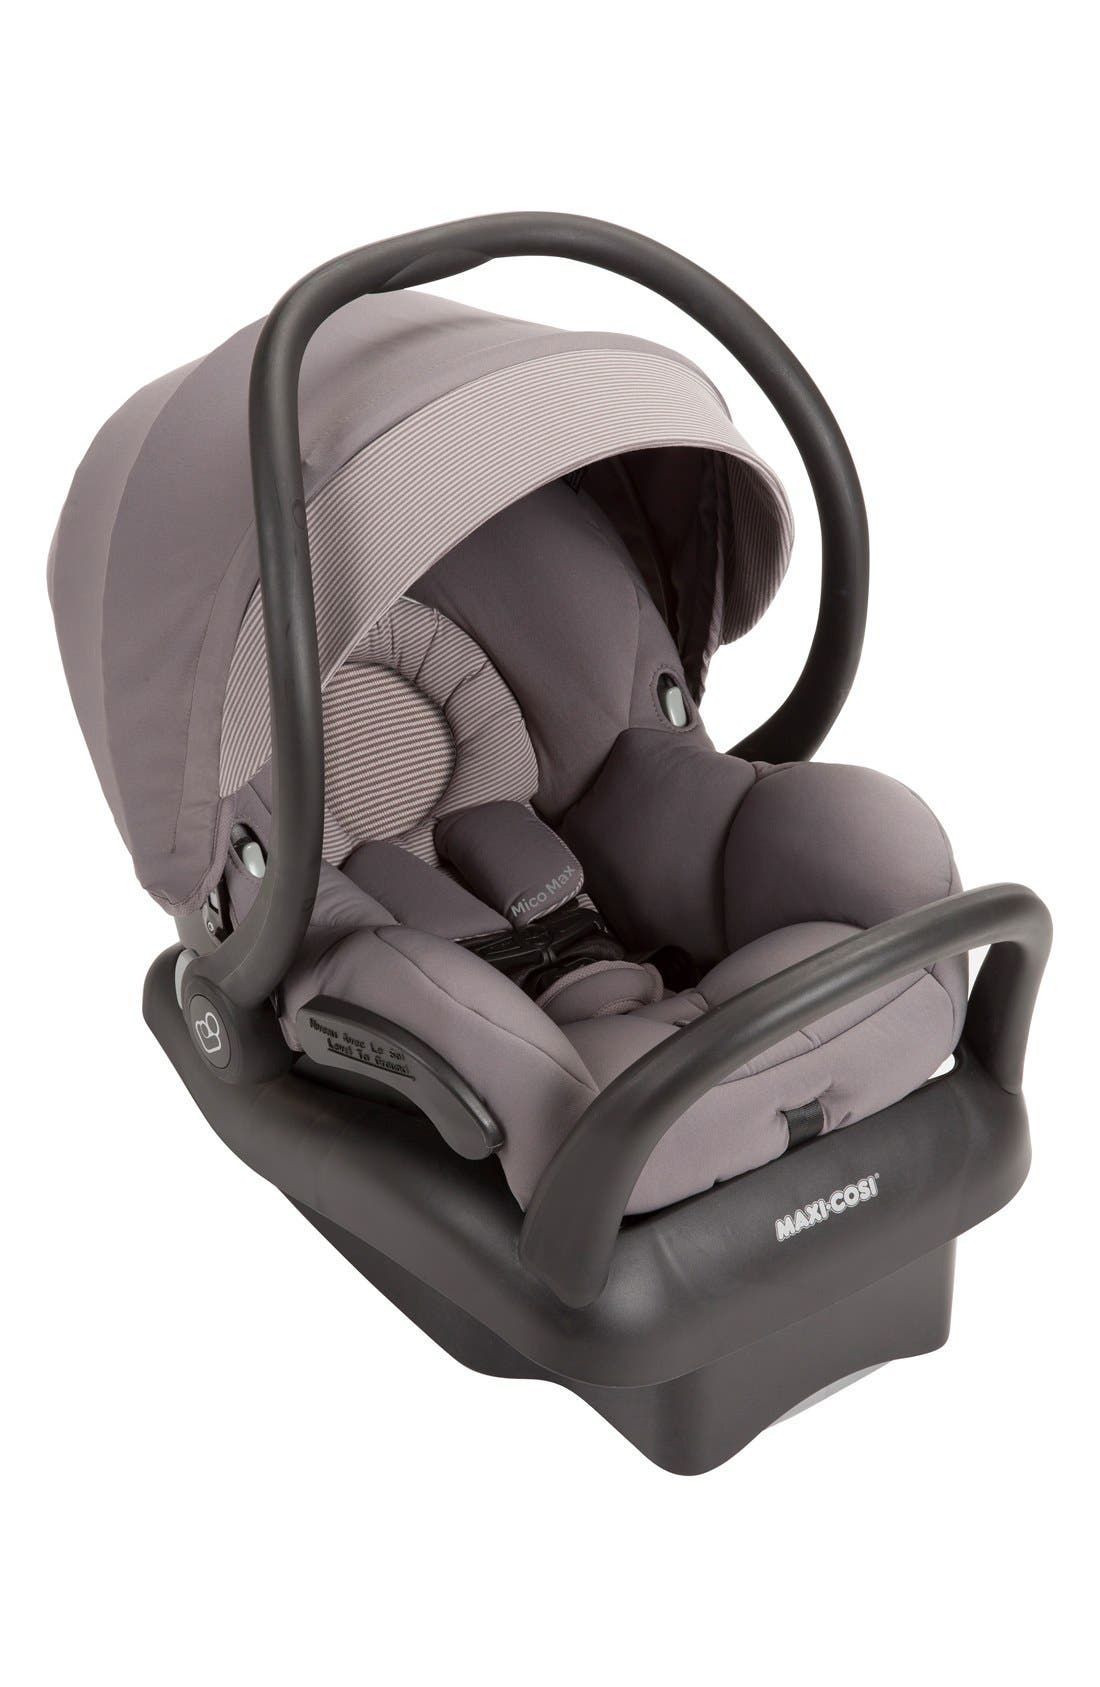 Mico Max 30 Infant Car Seat,                         Main,                         color, Grey Gravel